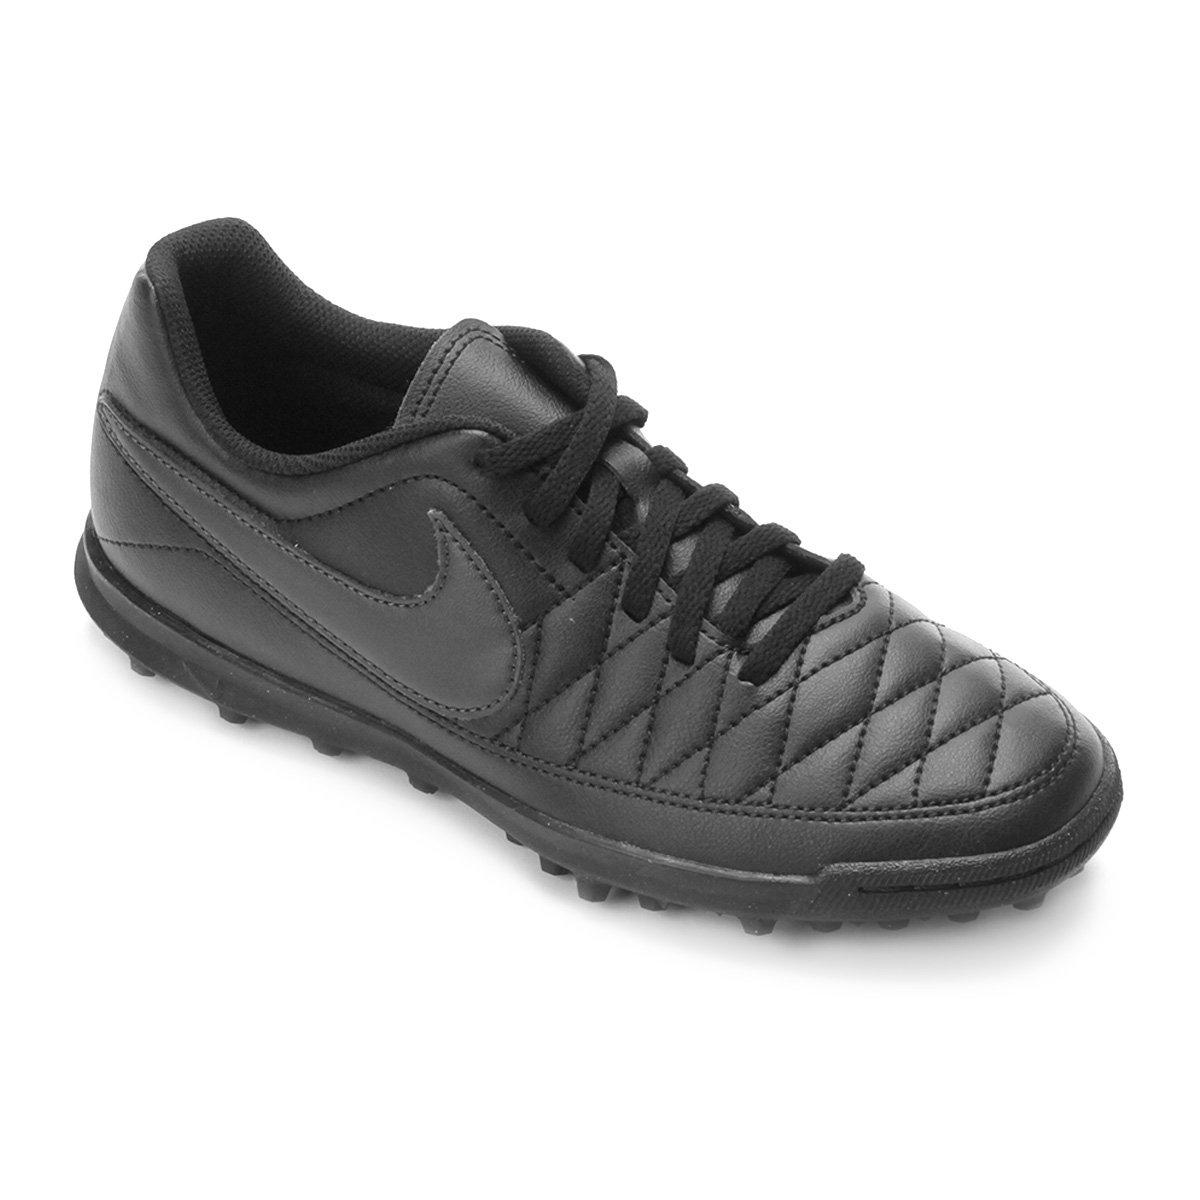 7aa567da2d Chuteira Society Nike Majestry TF - Preto - Compre Agora